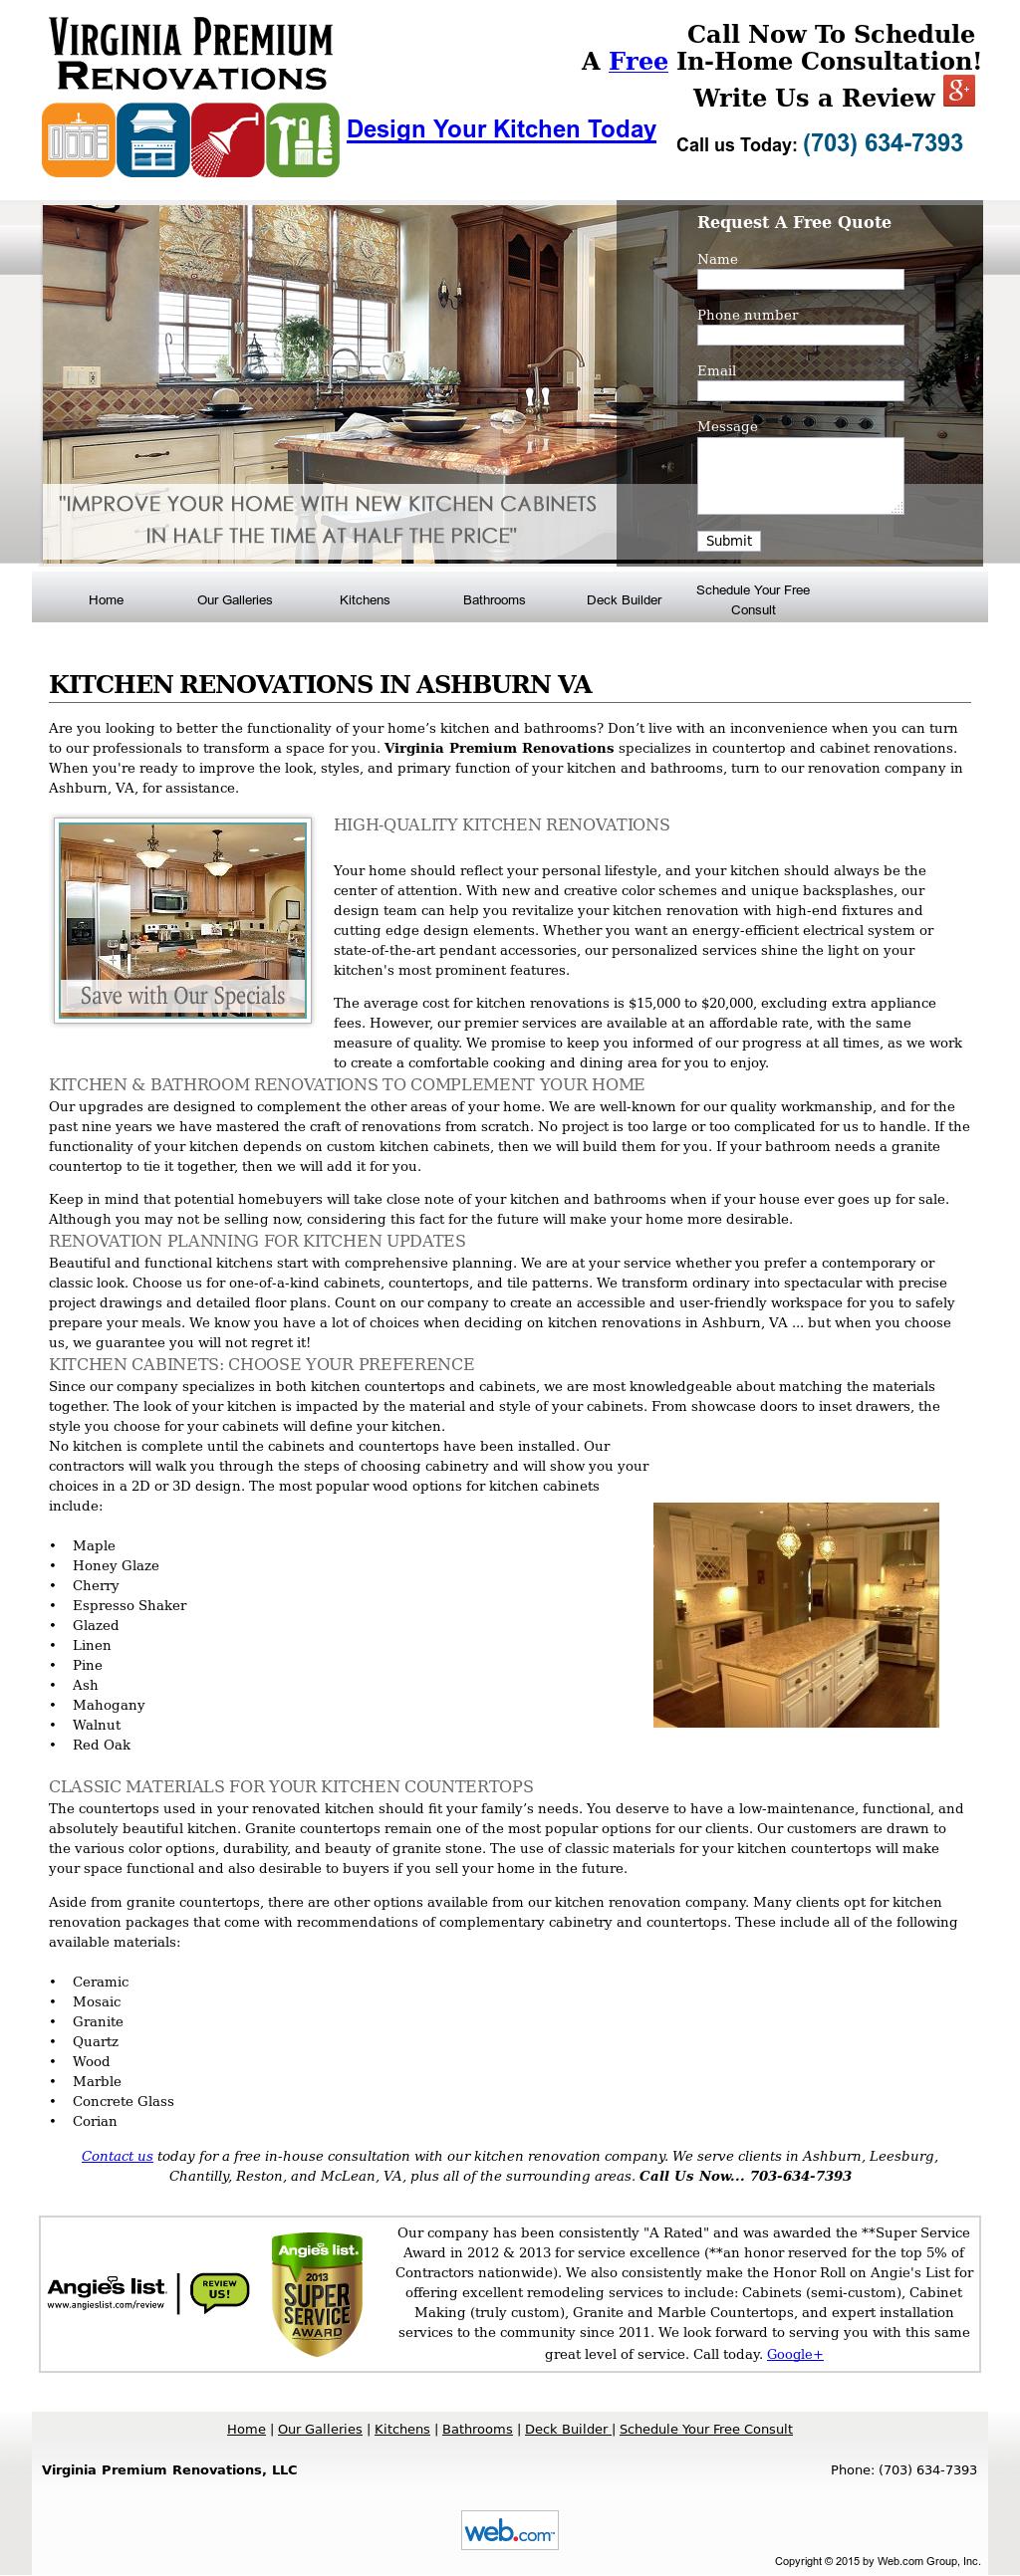 Virginia Premium Renovations Competitors, Revenue and Employees